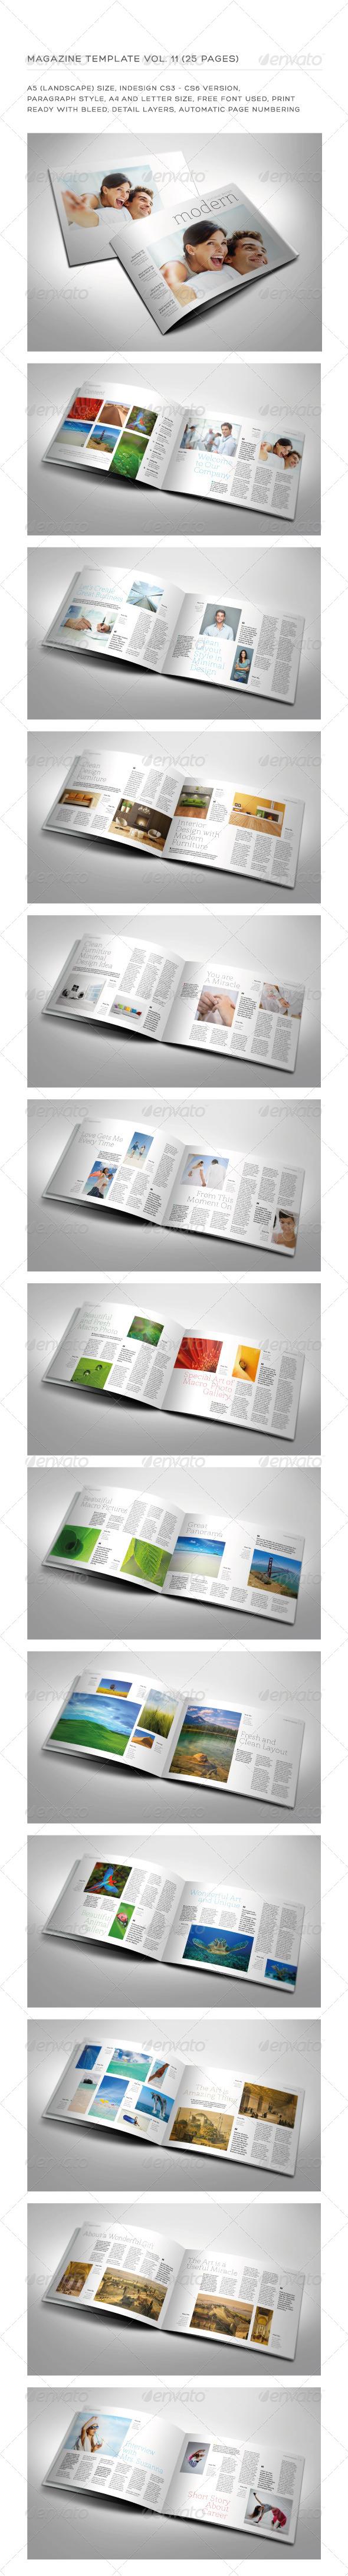 A5 Landscape 25 Pages mgz (Vol. 11) - Magazines Print Templates